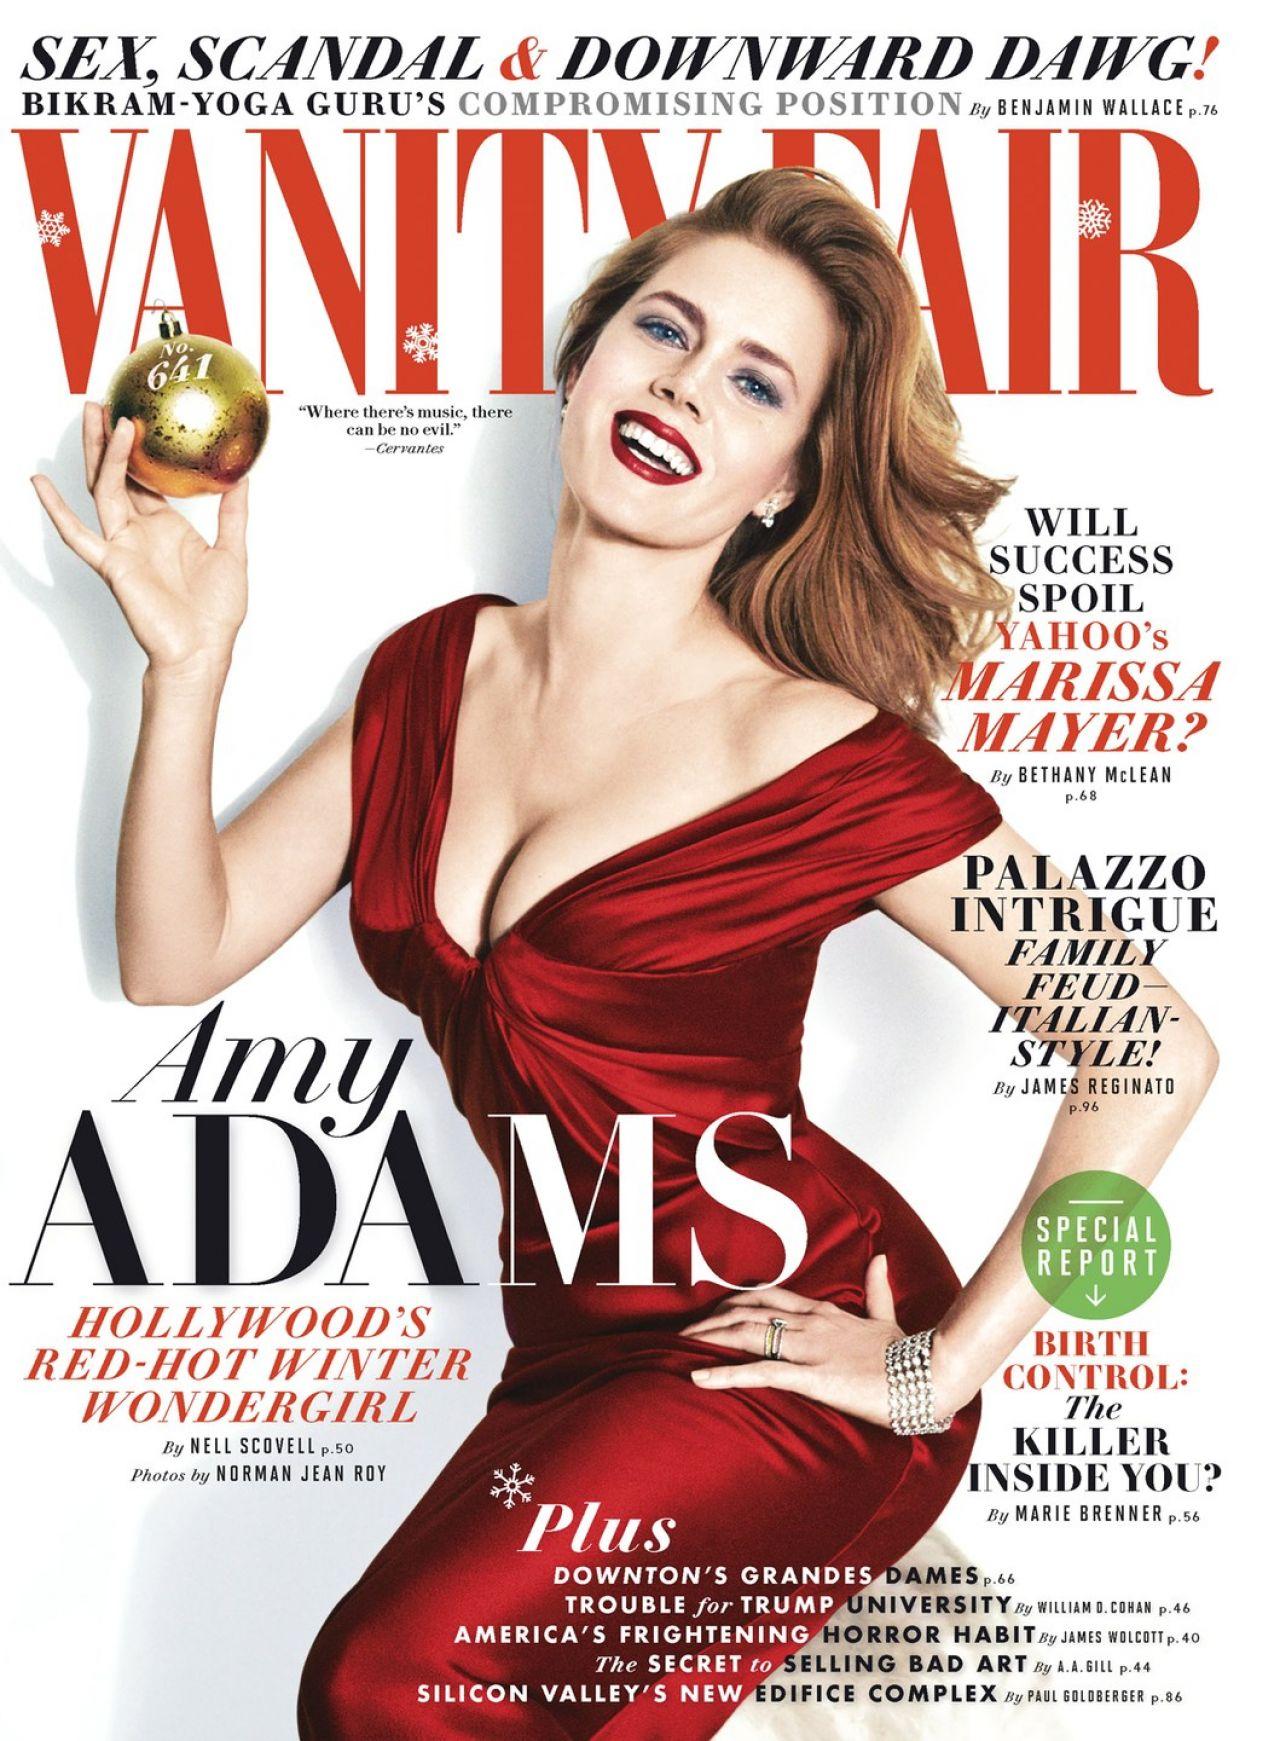 Amy Adams -  VANITY FAIR Magazine - January 2014 Issue - N. J. R. Photoshoot